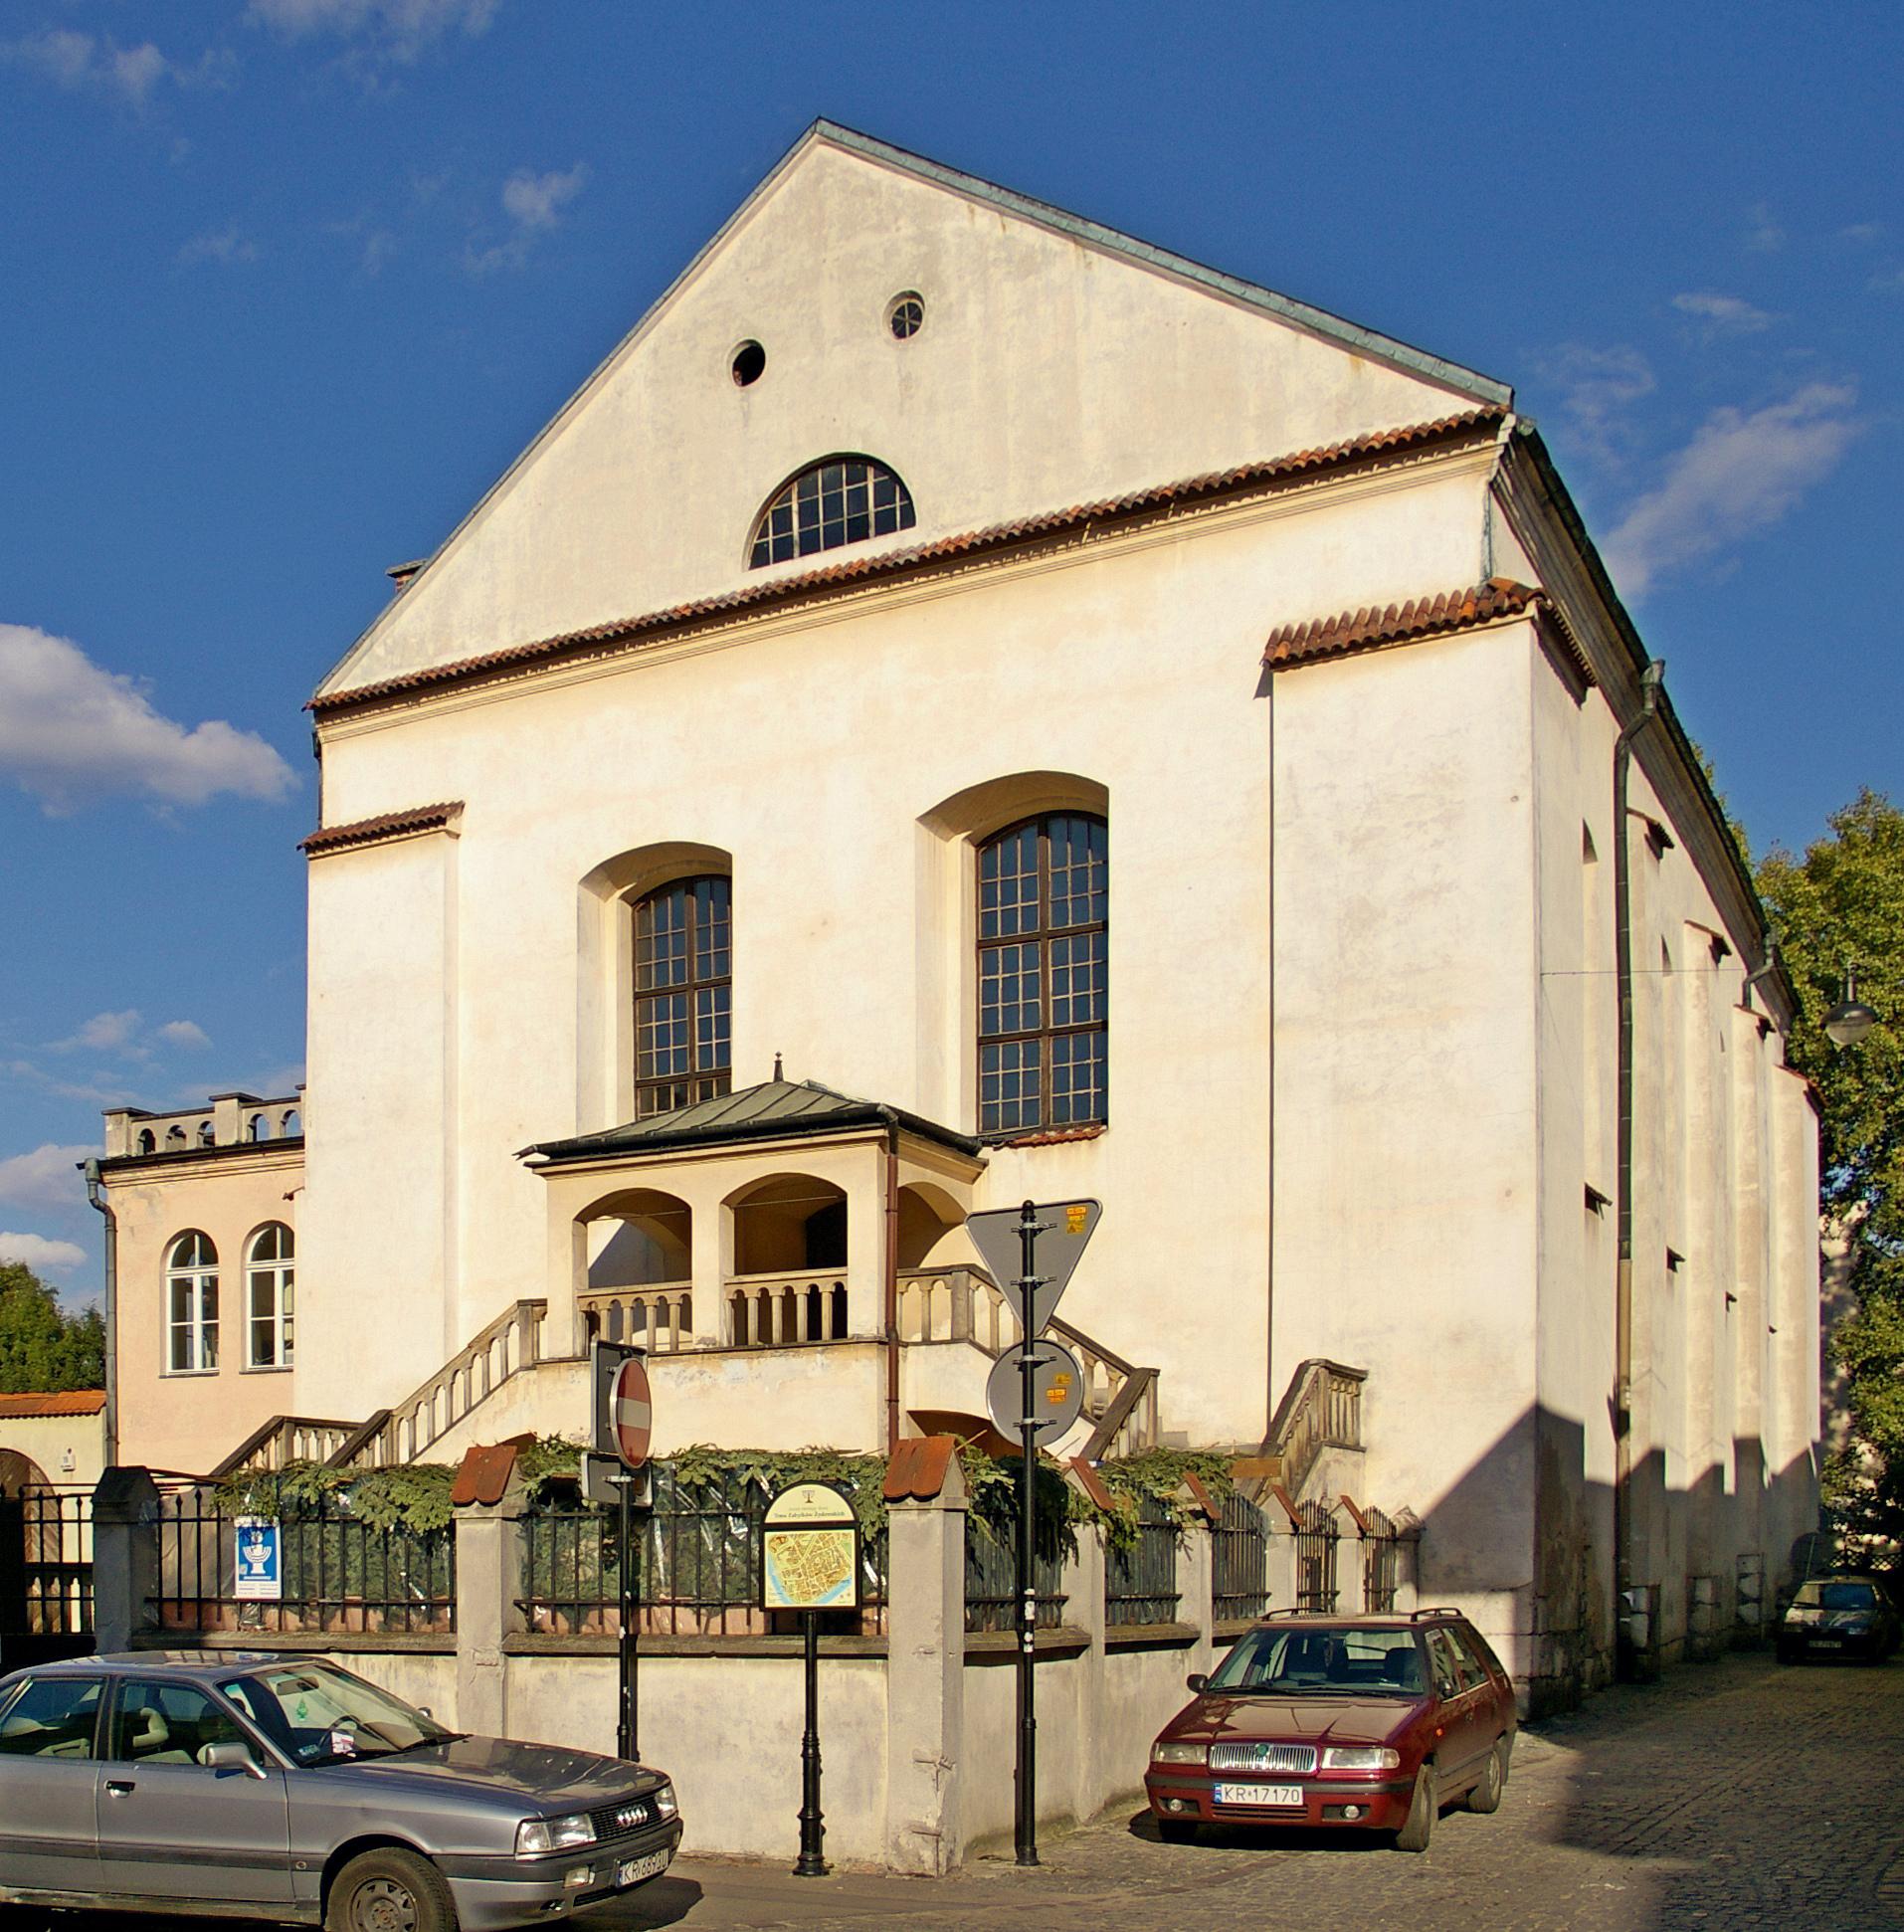 The Izaak Synagogue in Krakow